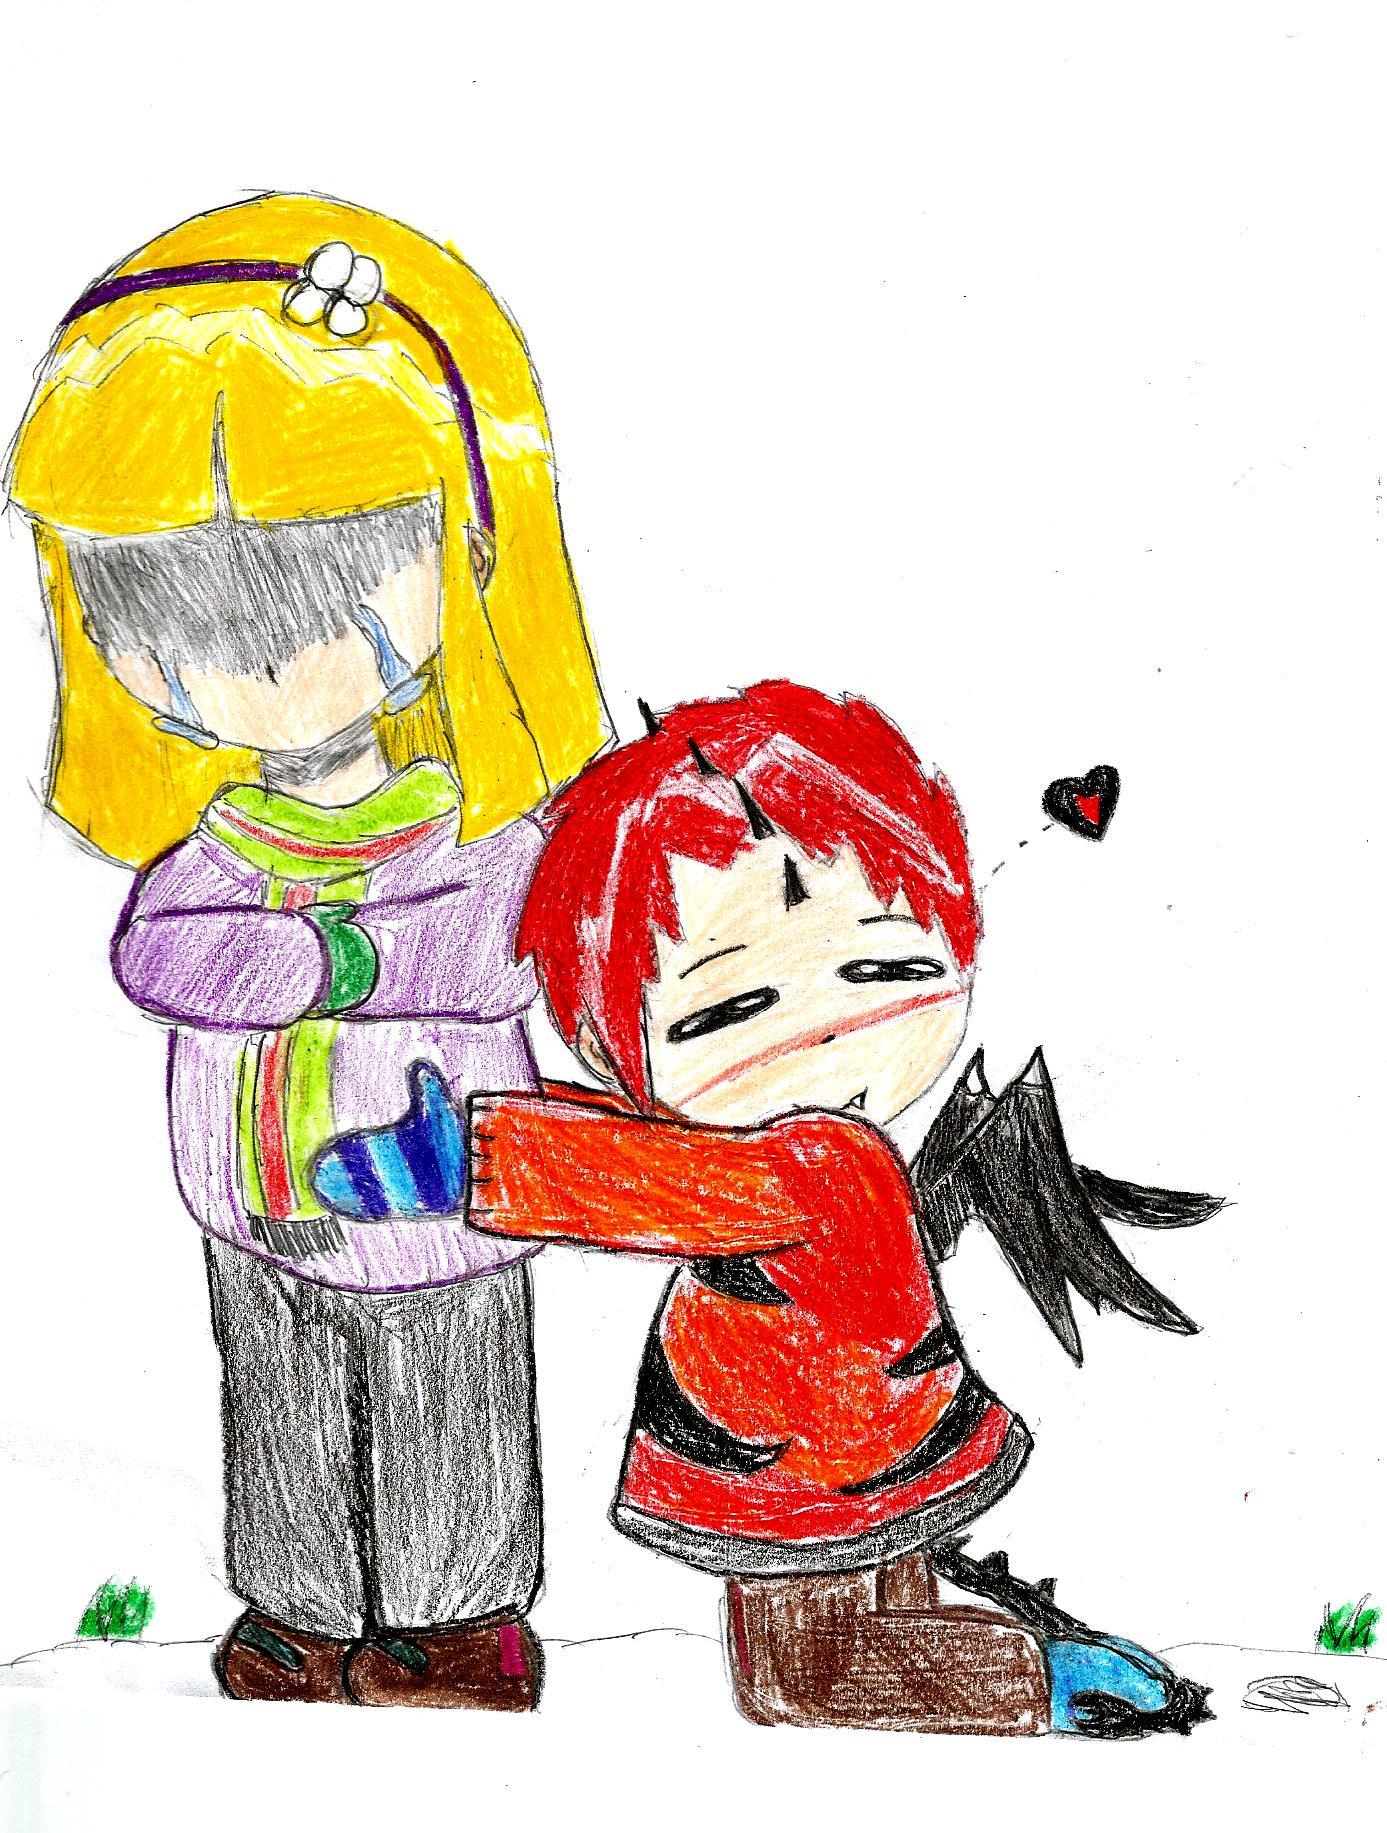 Lu and Minami